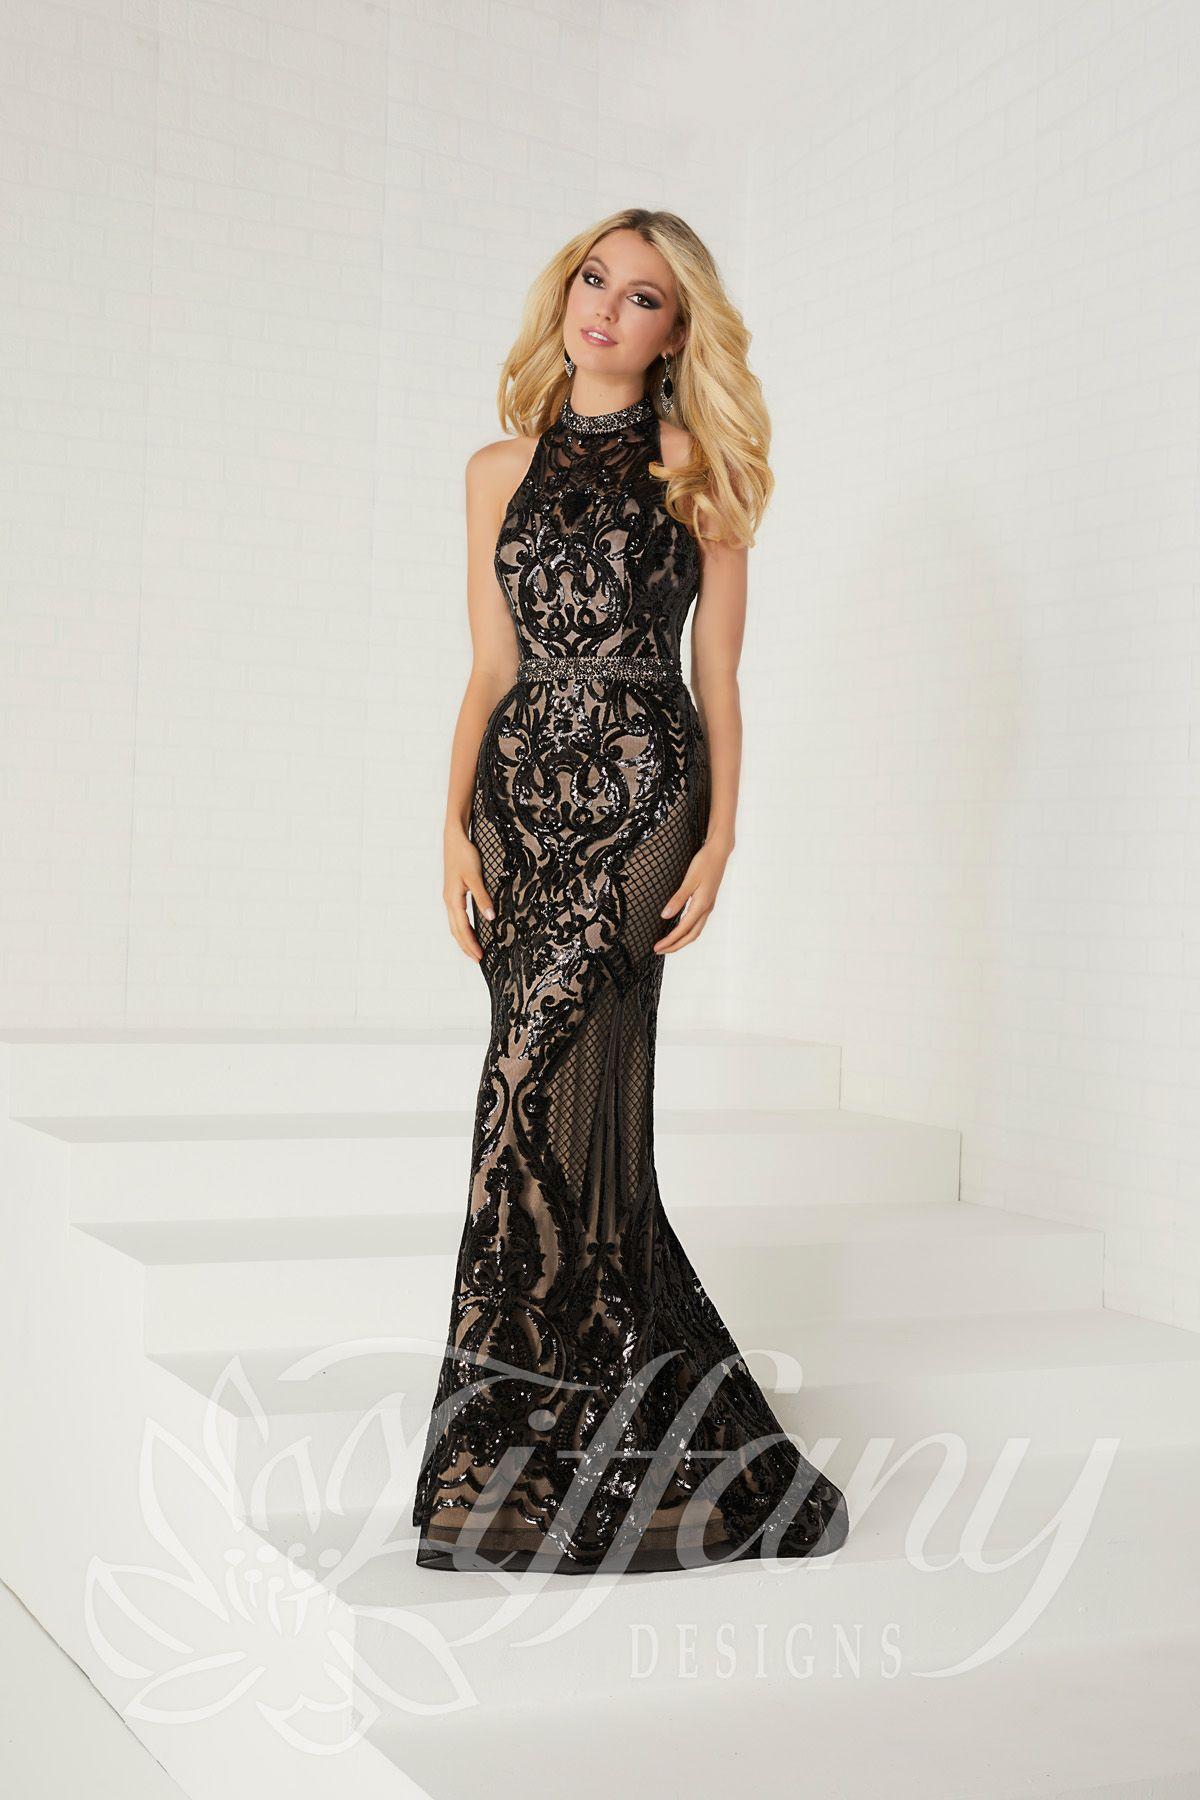 Looks We Love Tiffany 16263 - International Prom Association Dresses ...